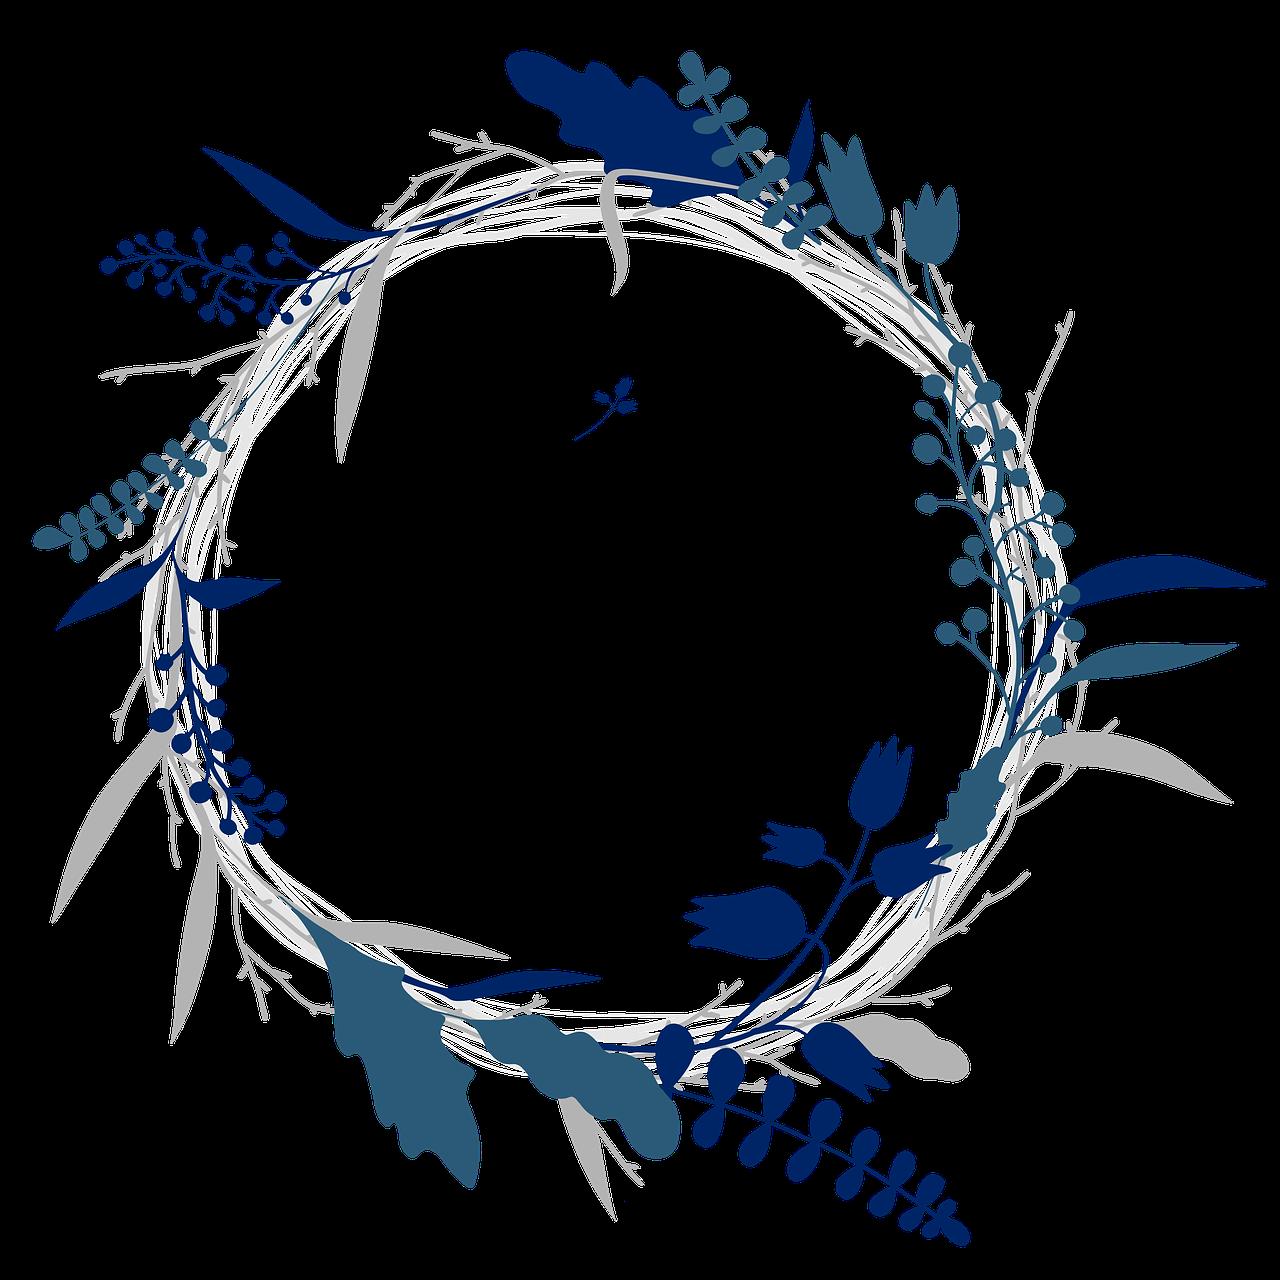 OHMAOH / Pixabay